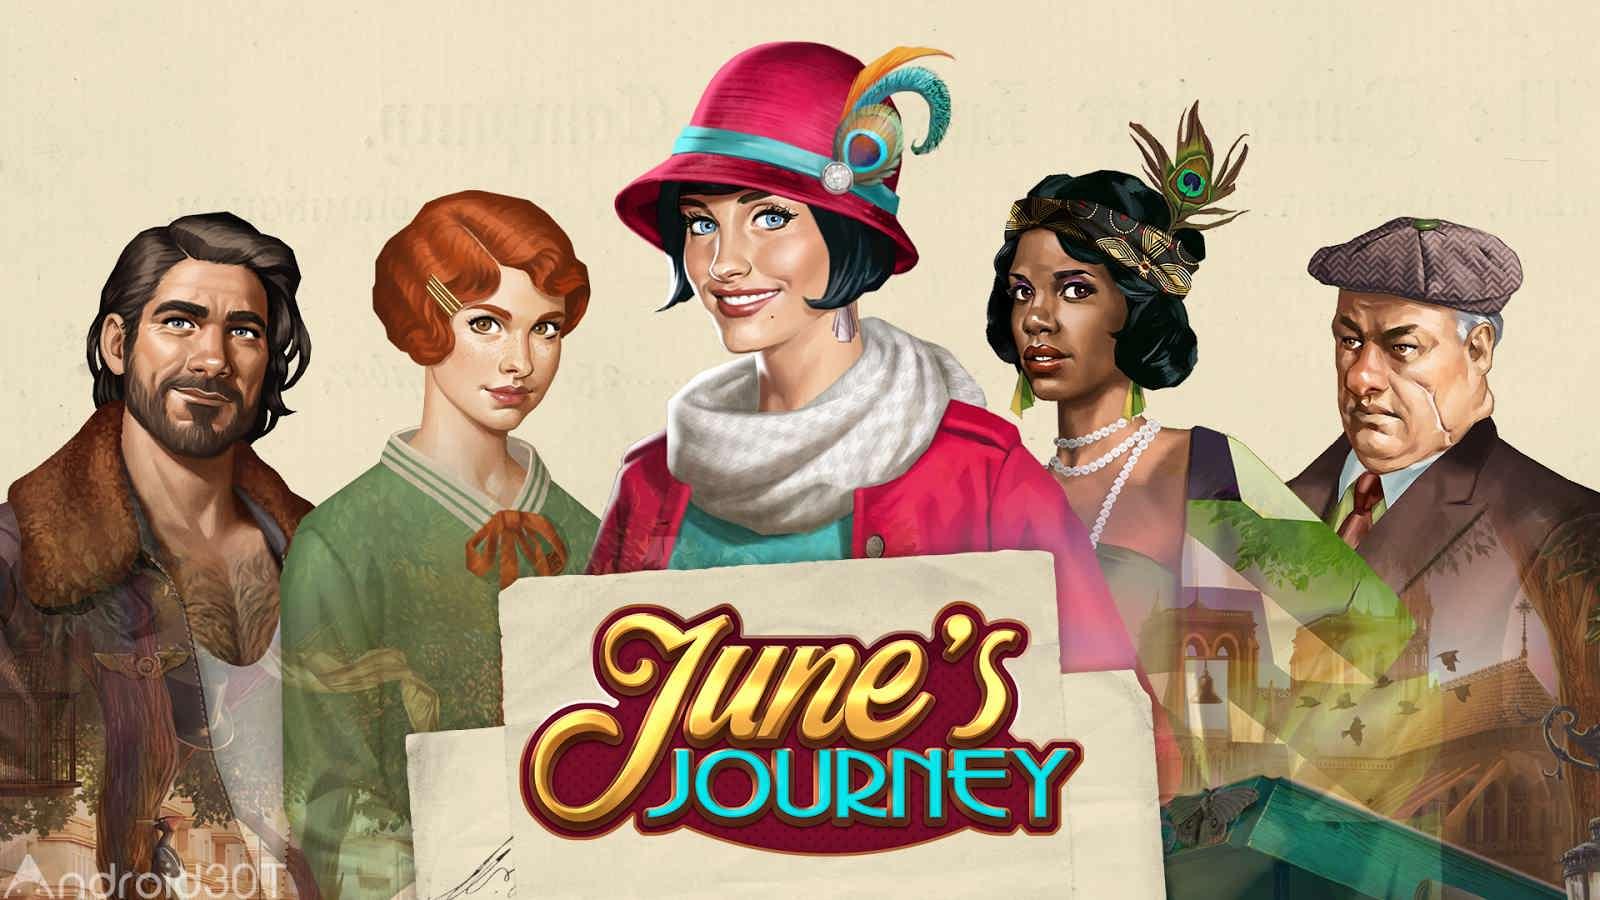 دانلود June's Journey – Hidden Object 2.24.3 – بازی ماجراجویی سفر پر ماجرا اندروید